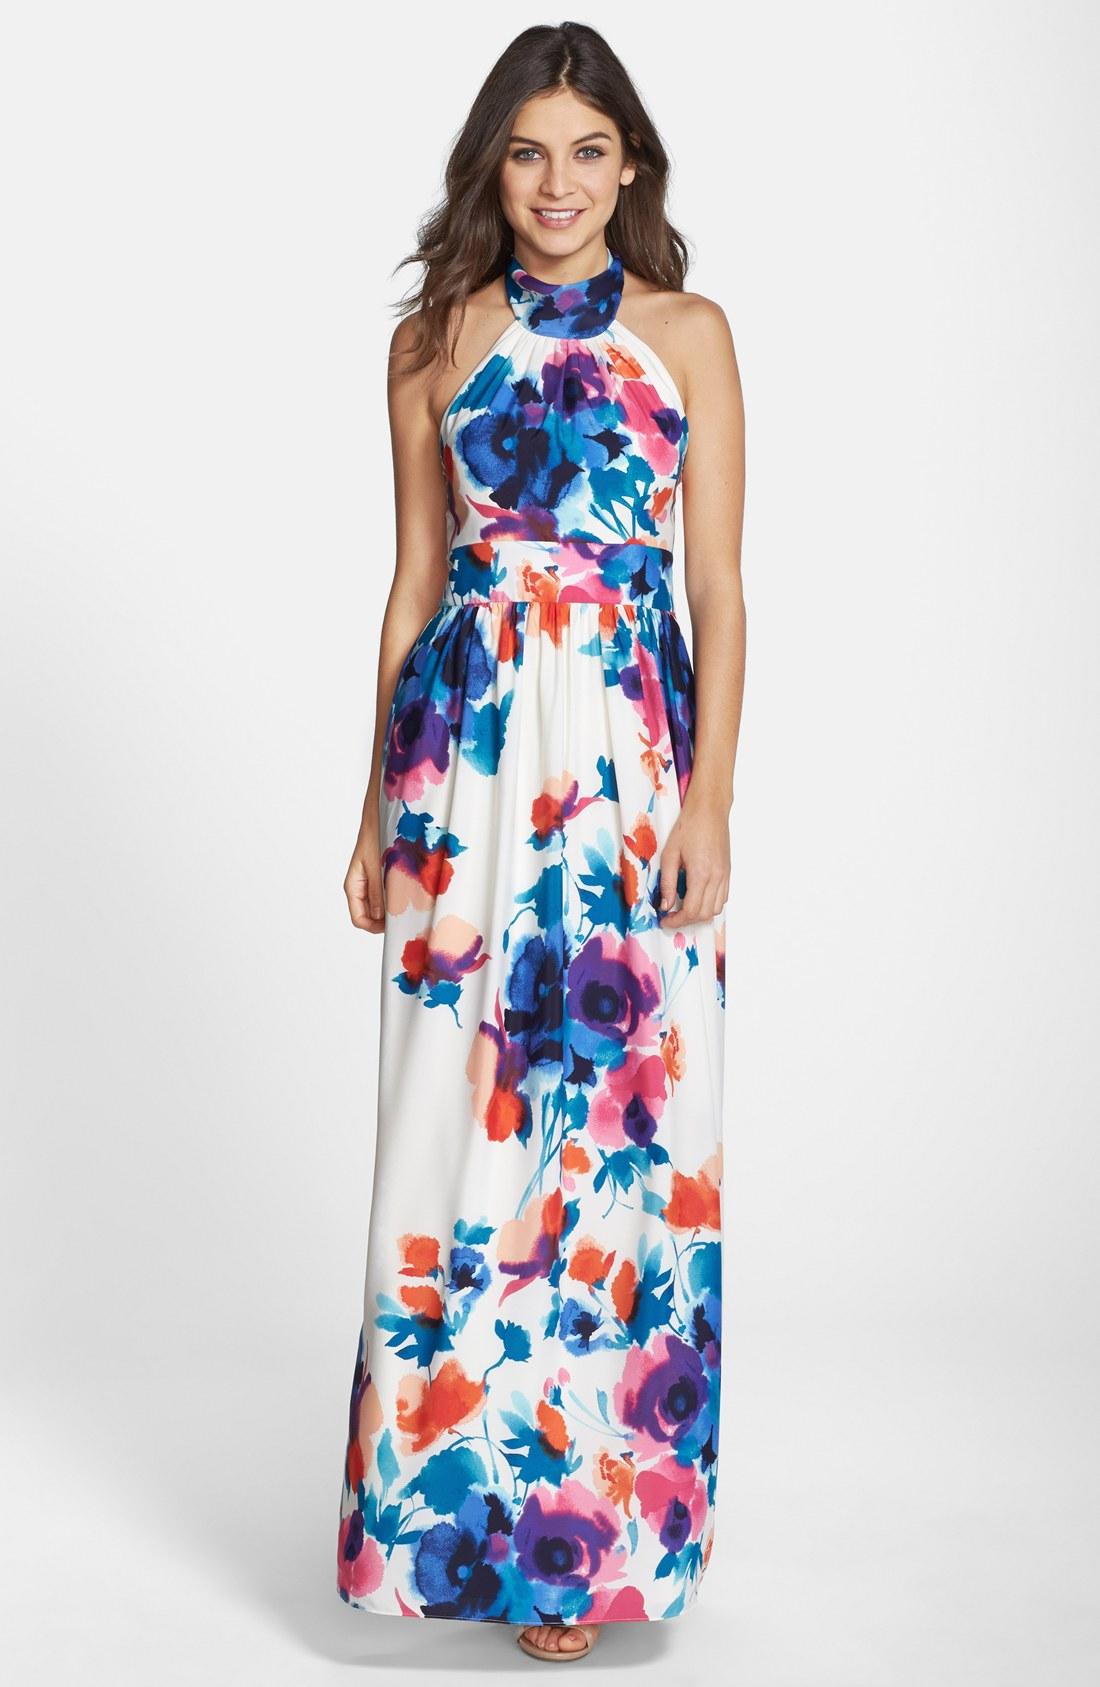 Another halter-neck maxi dress